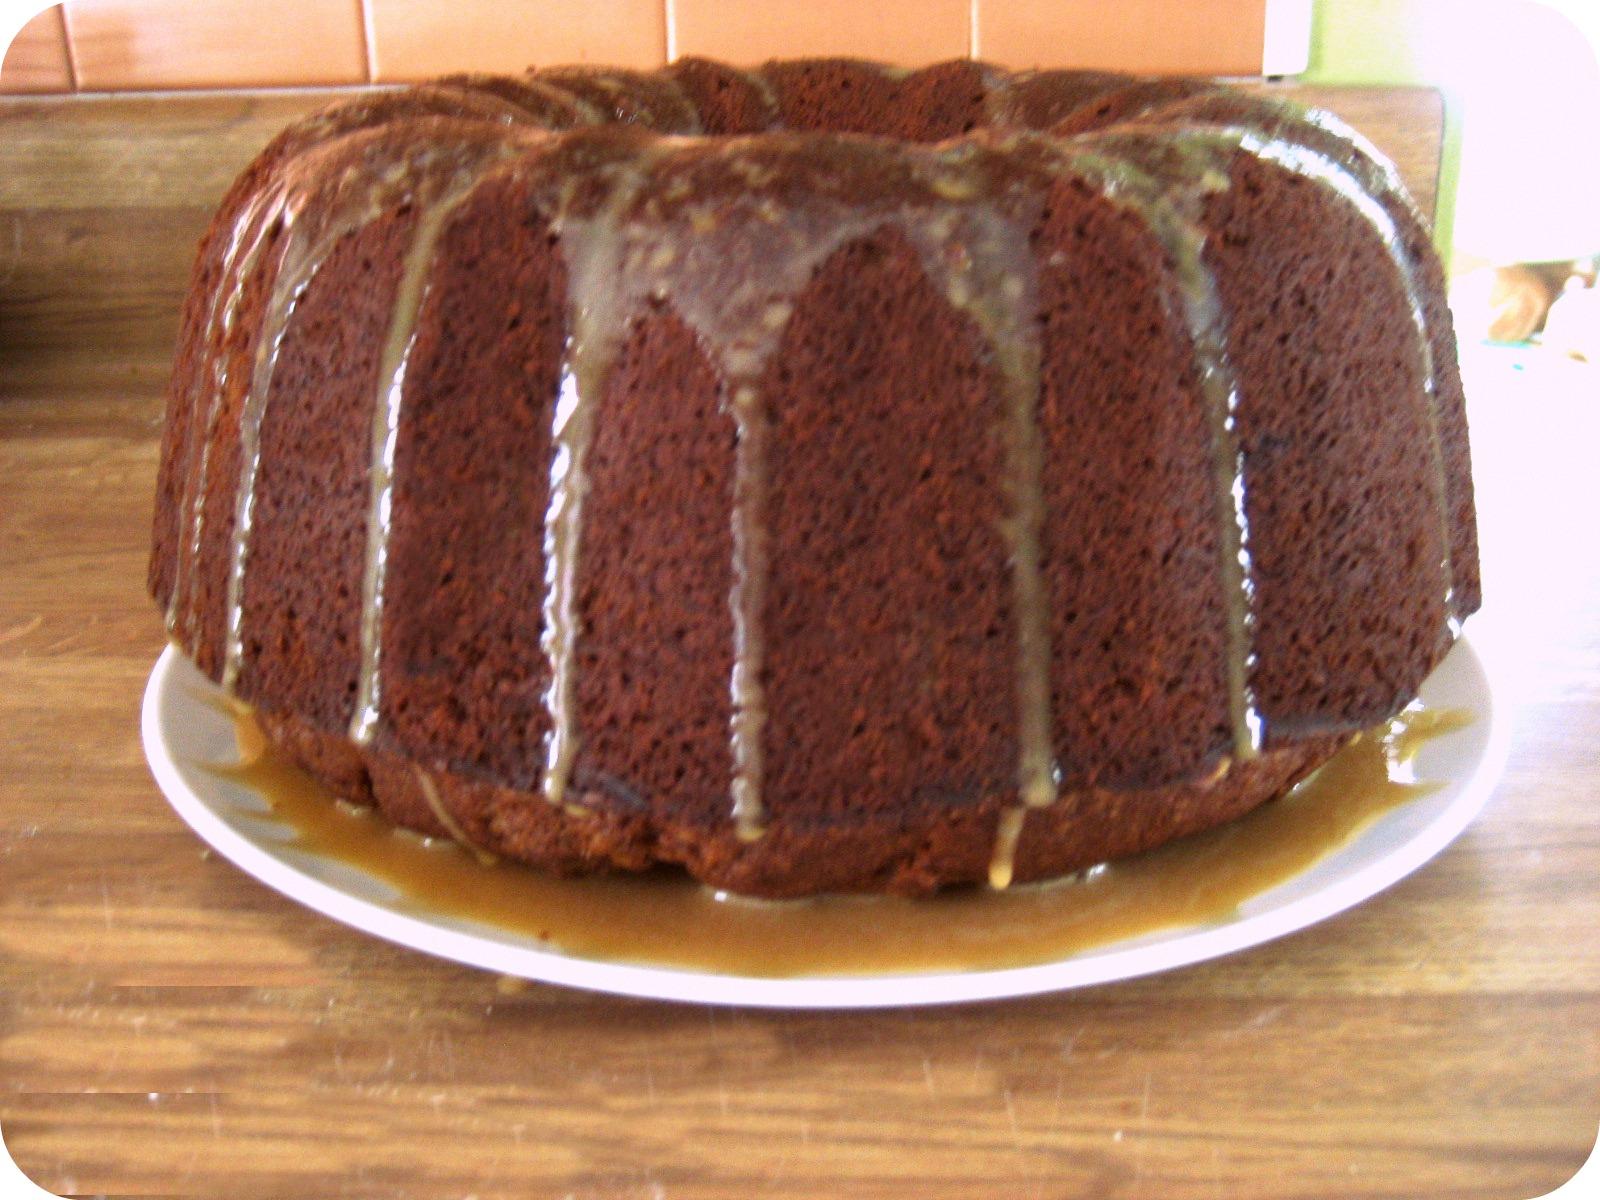 threaded basil: Cardamom Coffee Pound Cake